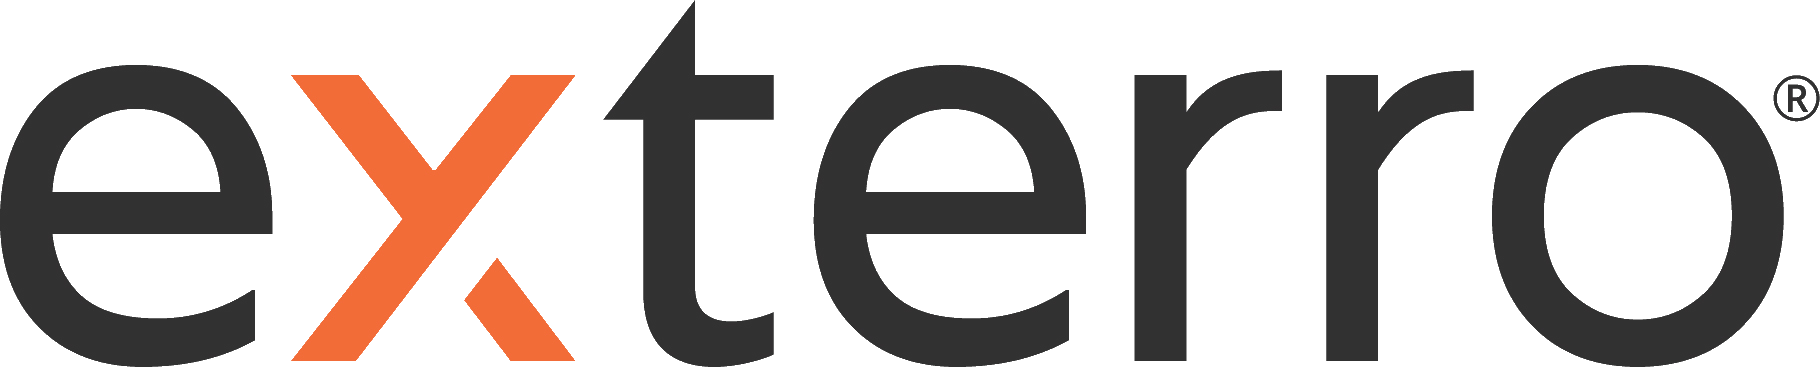 exterro logo